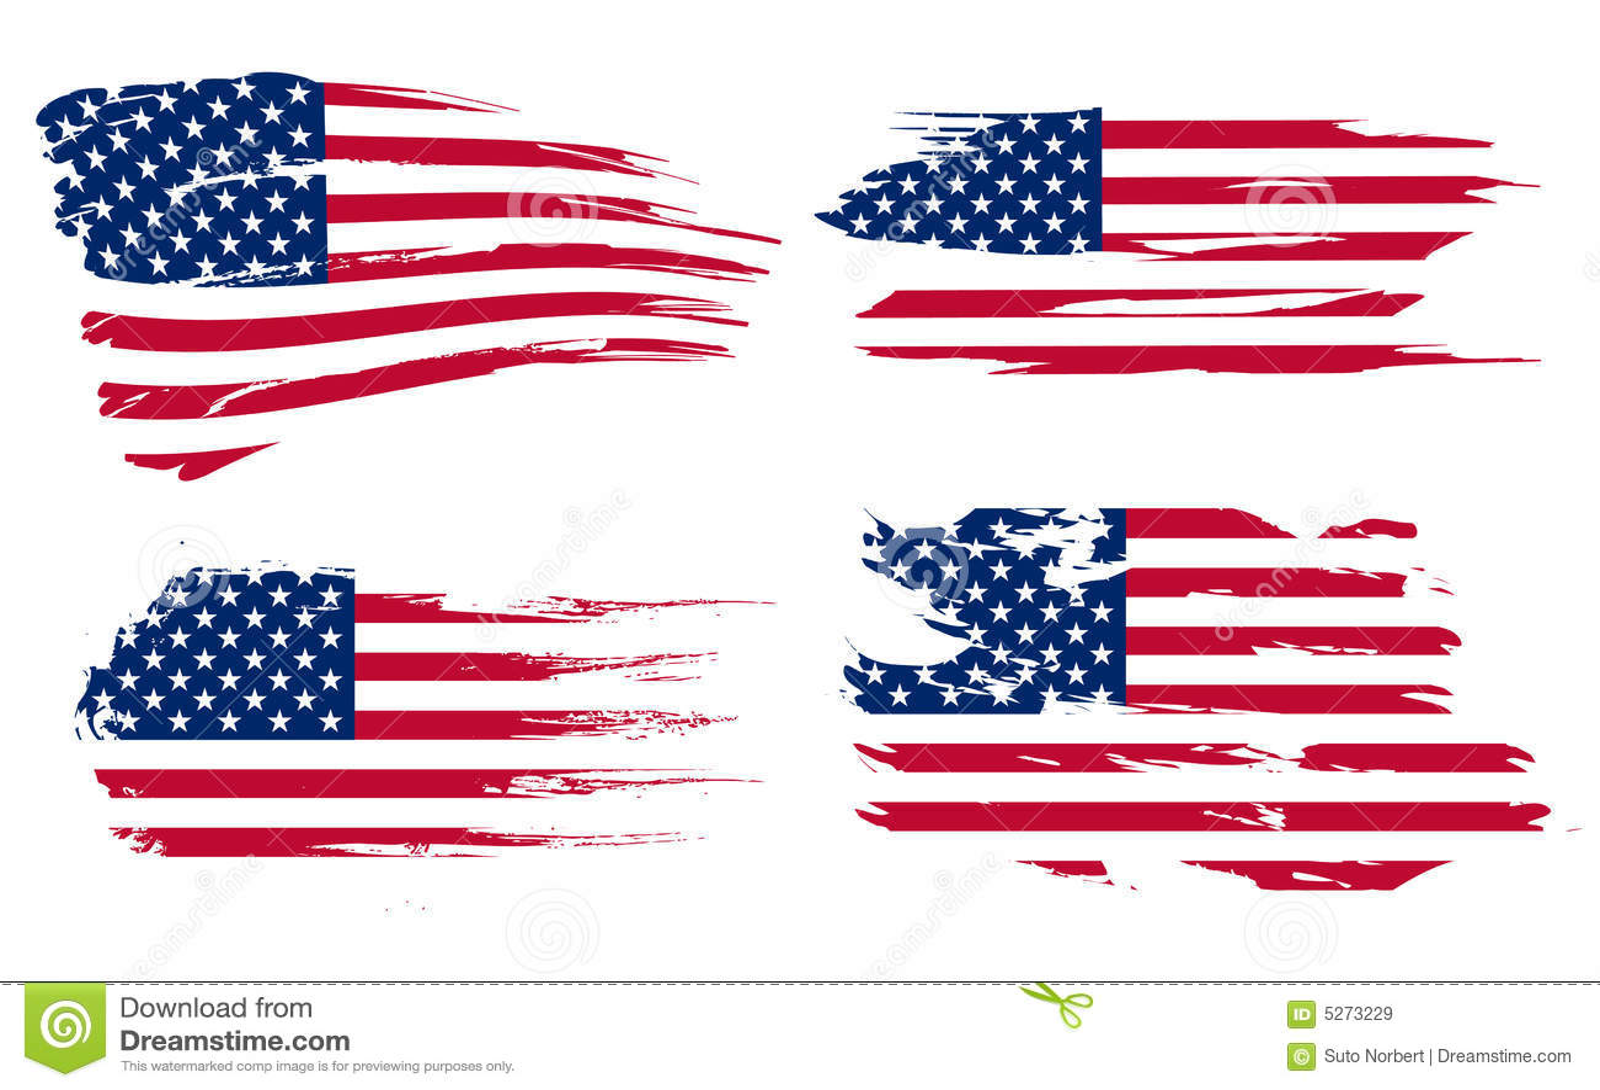 american flag vintage vector - photo #21